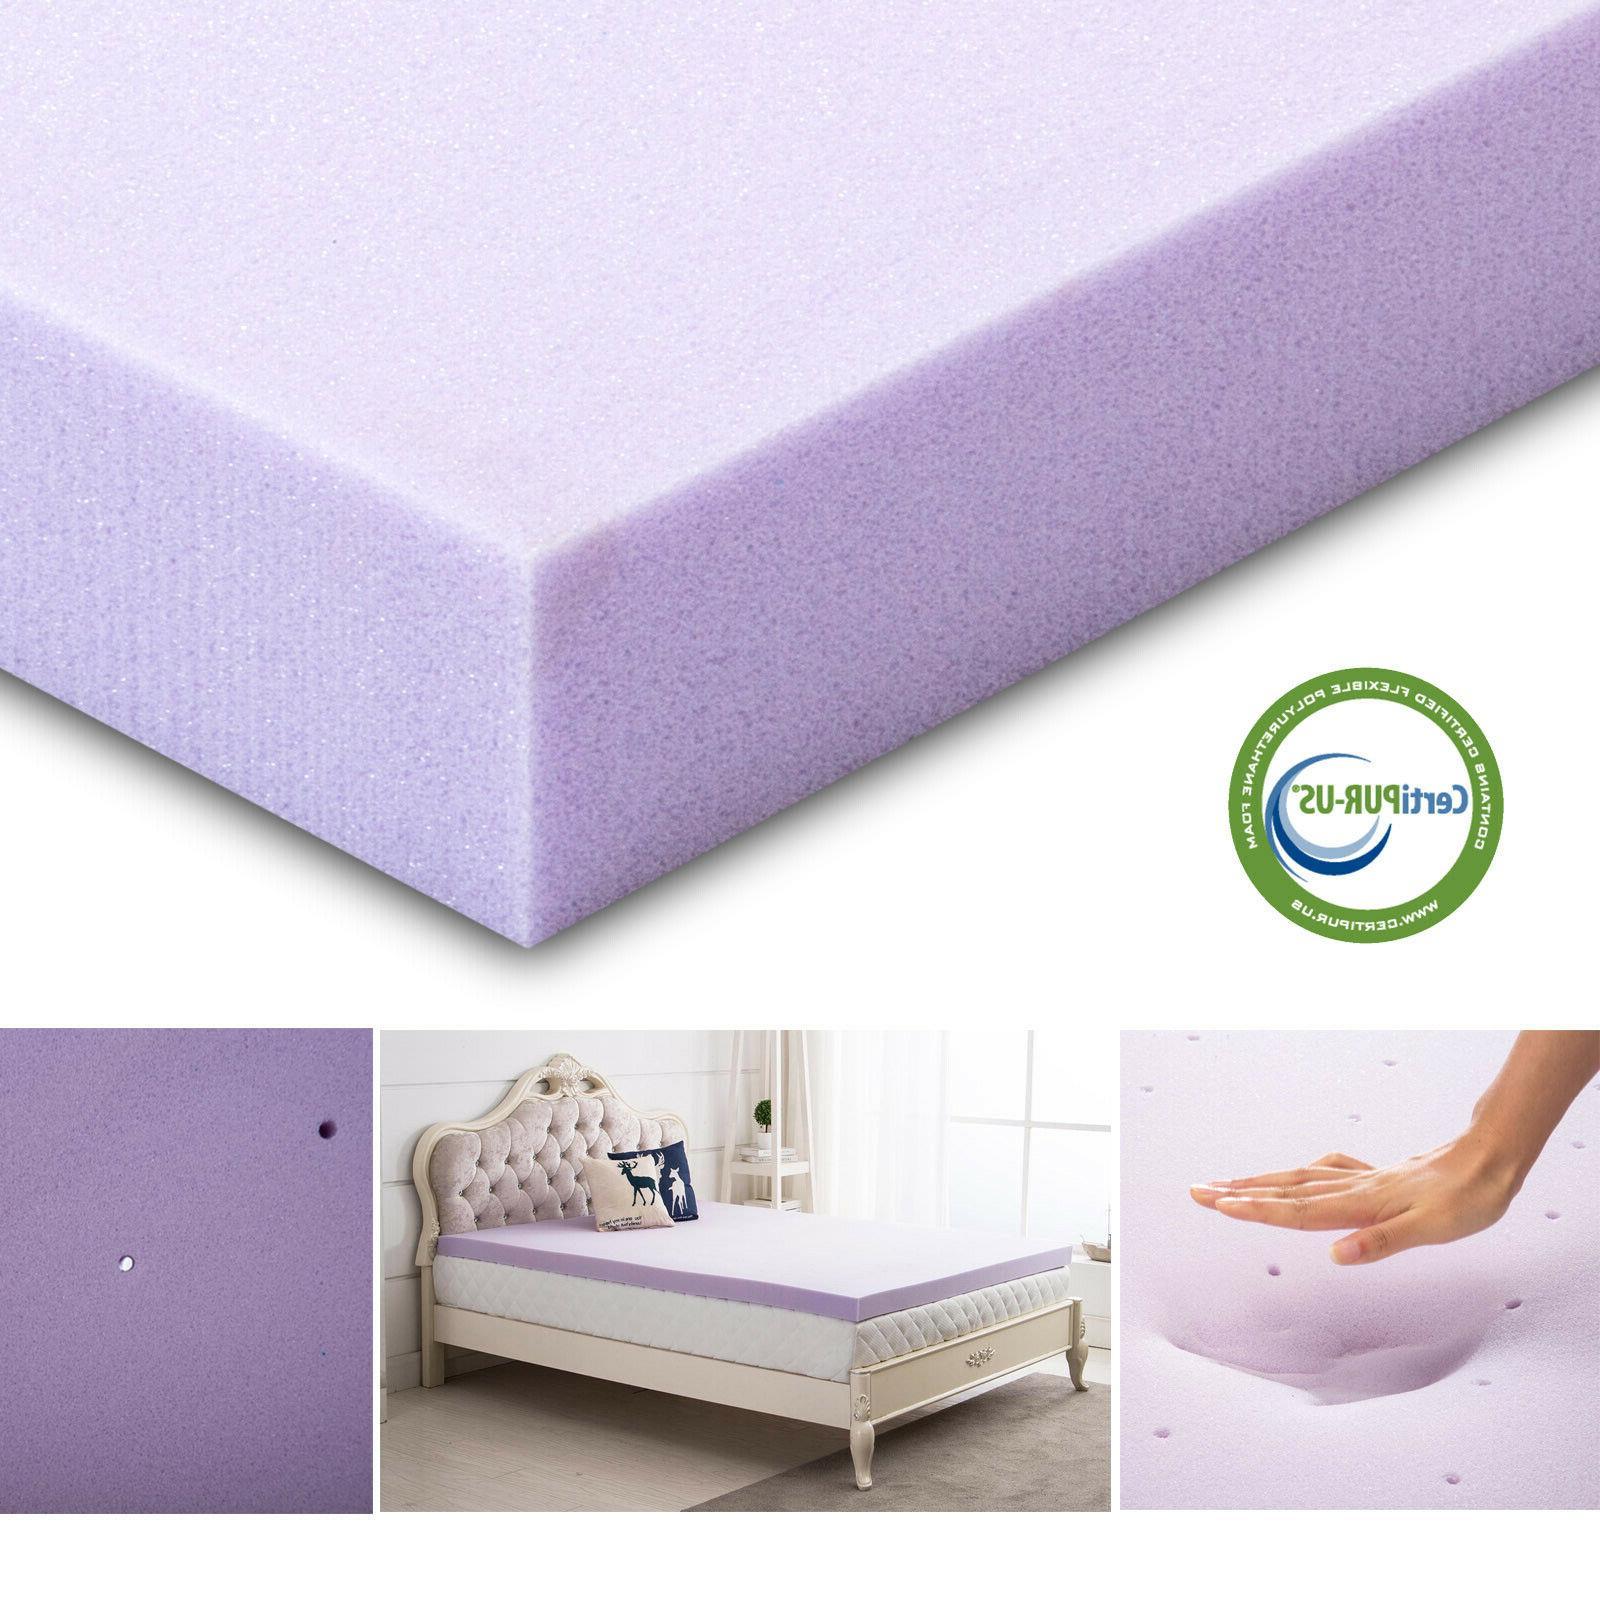 3 Inch Twin Memory Foam Mattress Topper Lavender Comfort Sof